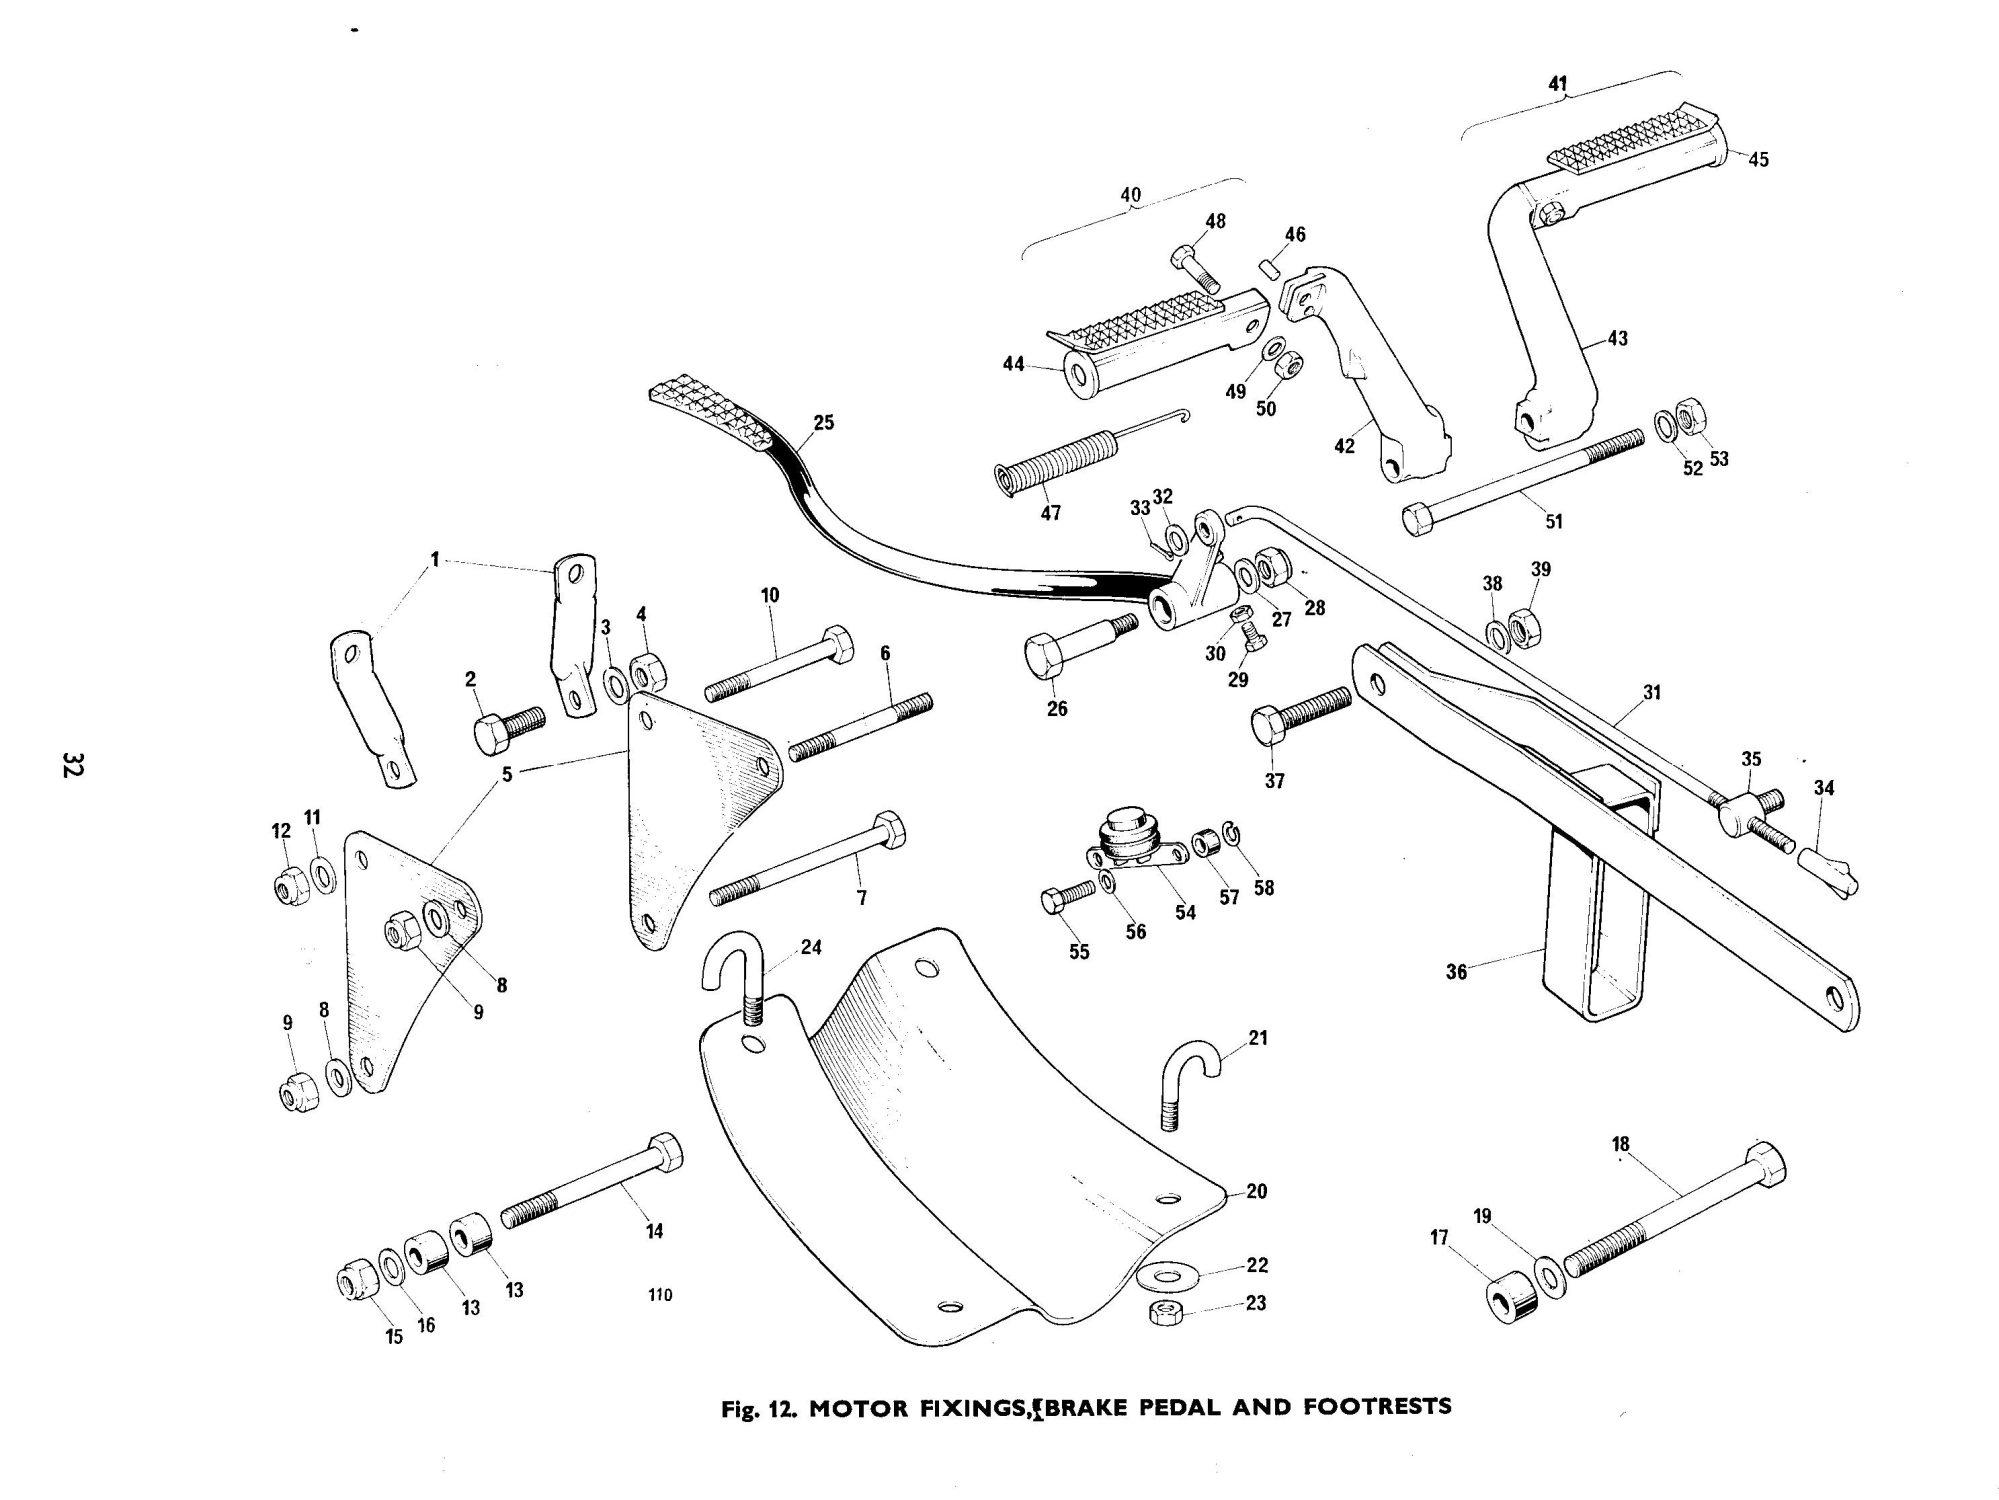 hight resolution of bsa b50 b50t rear brake chain guide torque arm h75